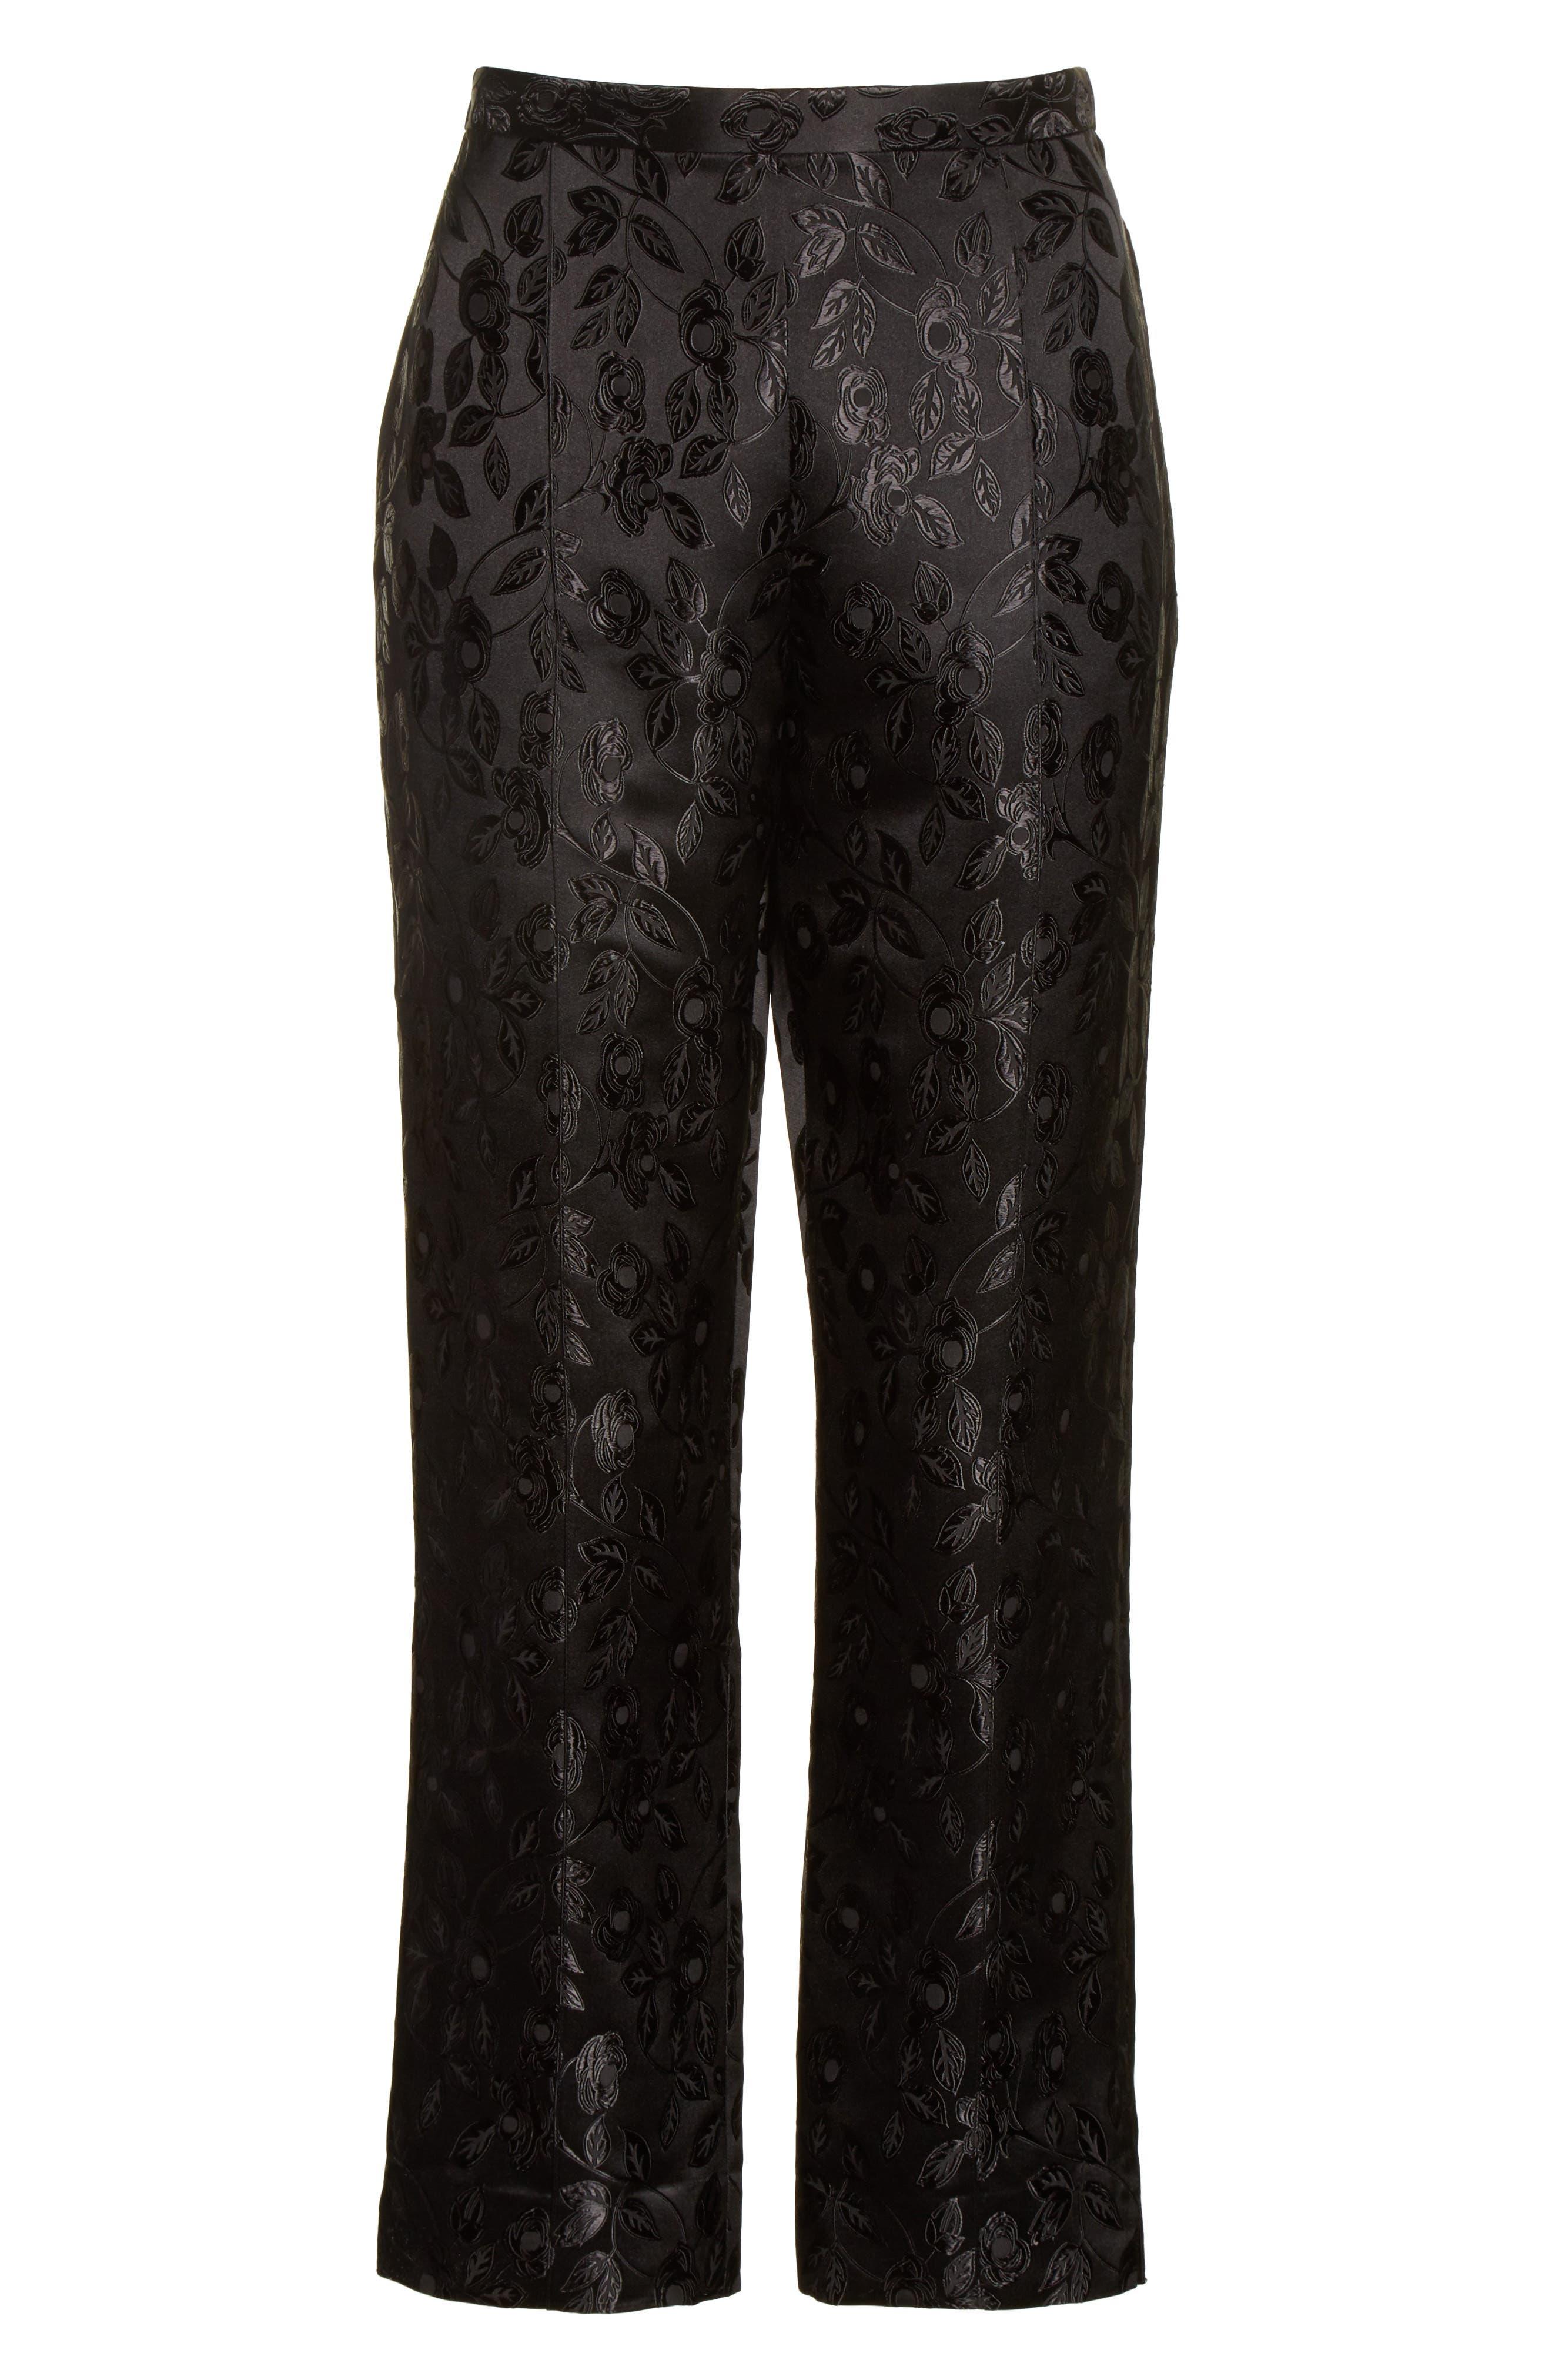 Jacquard Crop Pants,                             Alternate thumbnail 7, color,                             Black